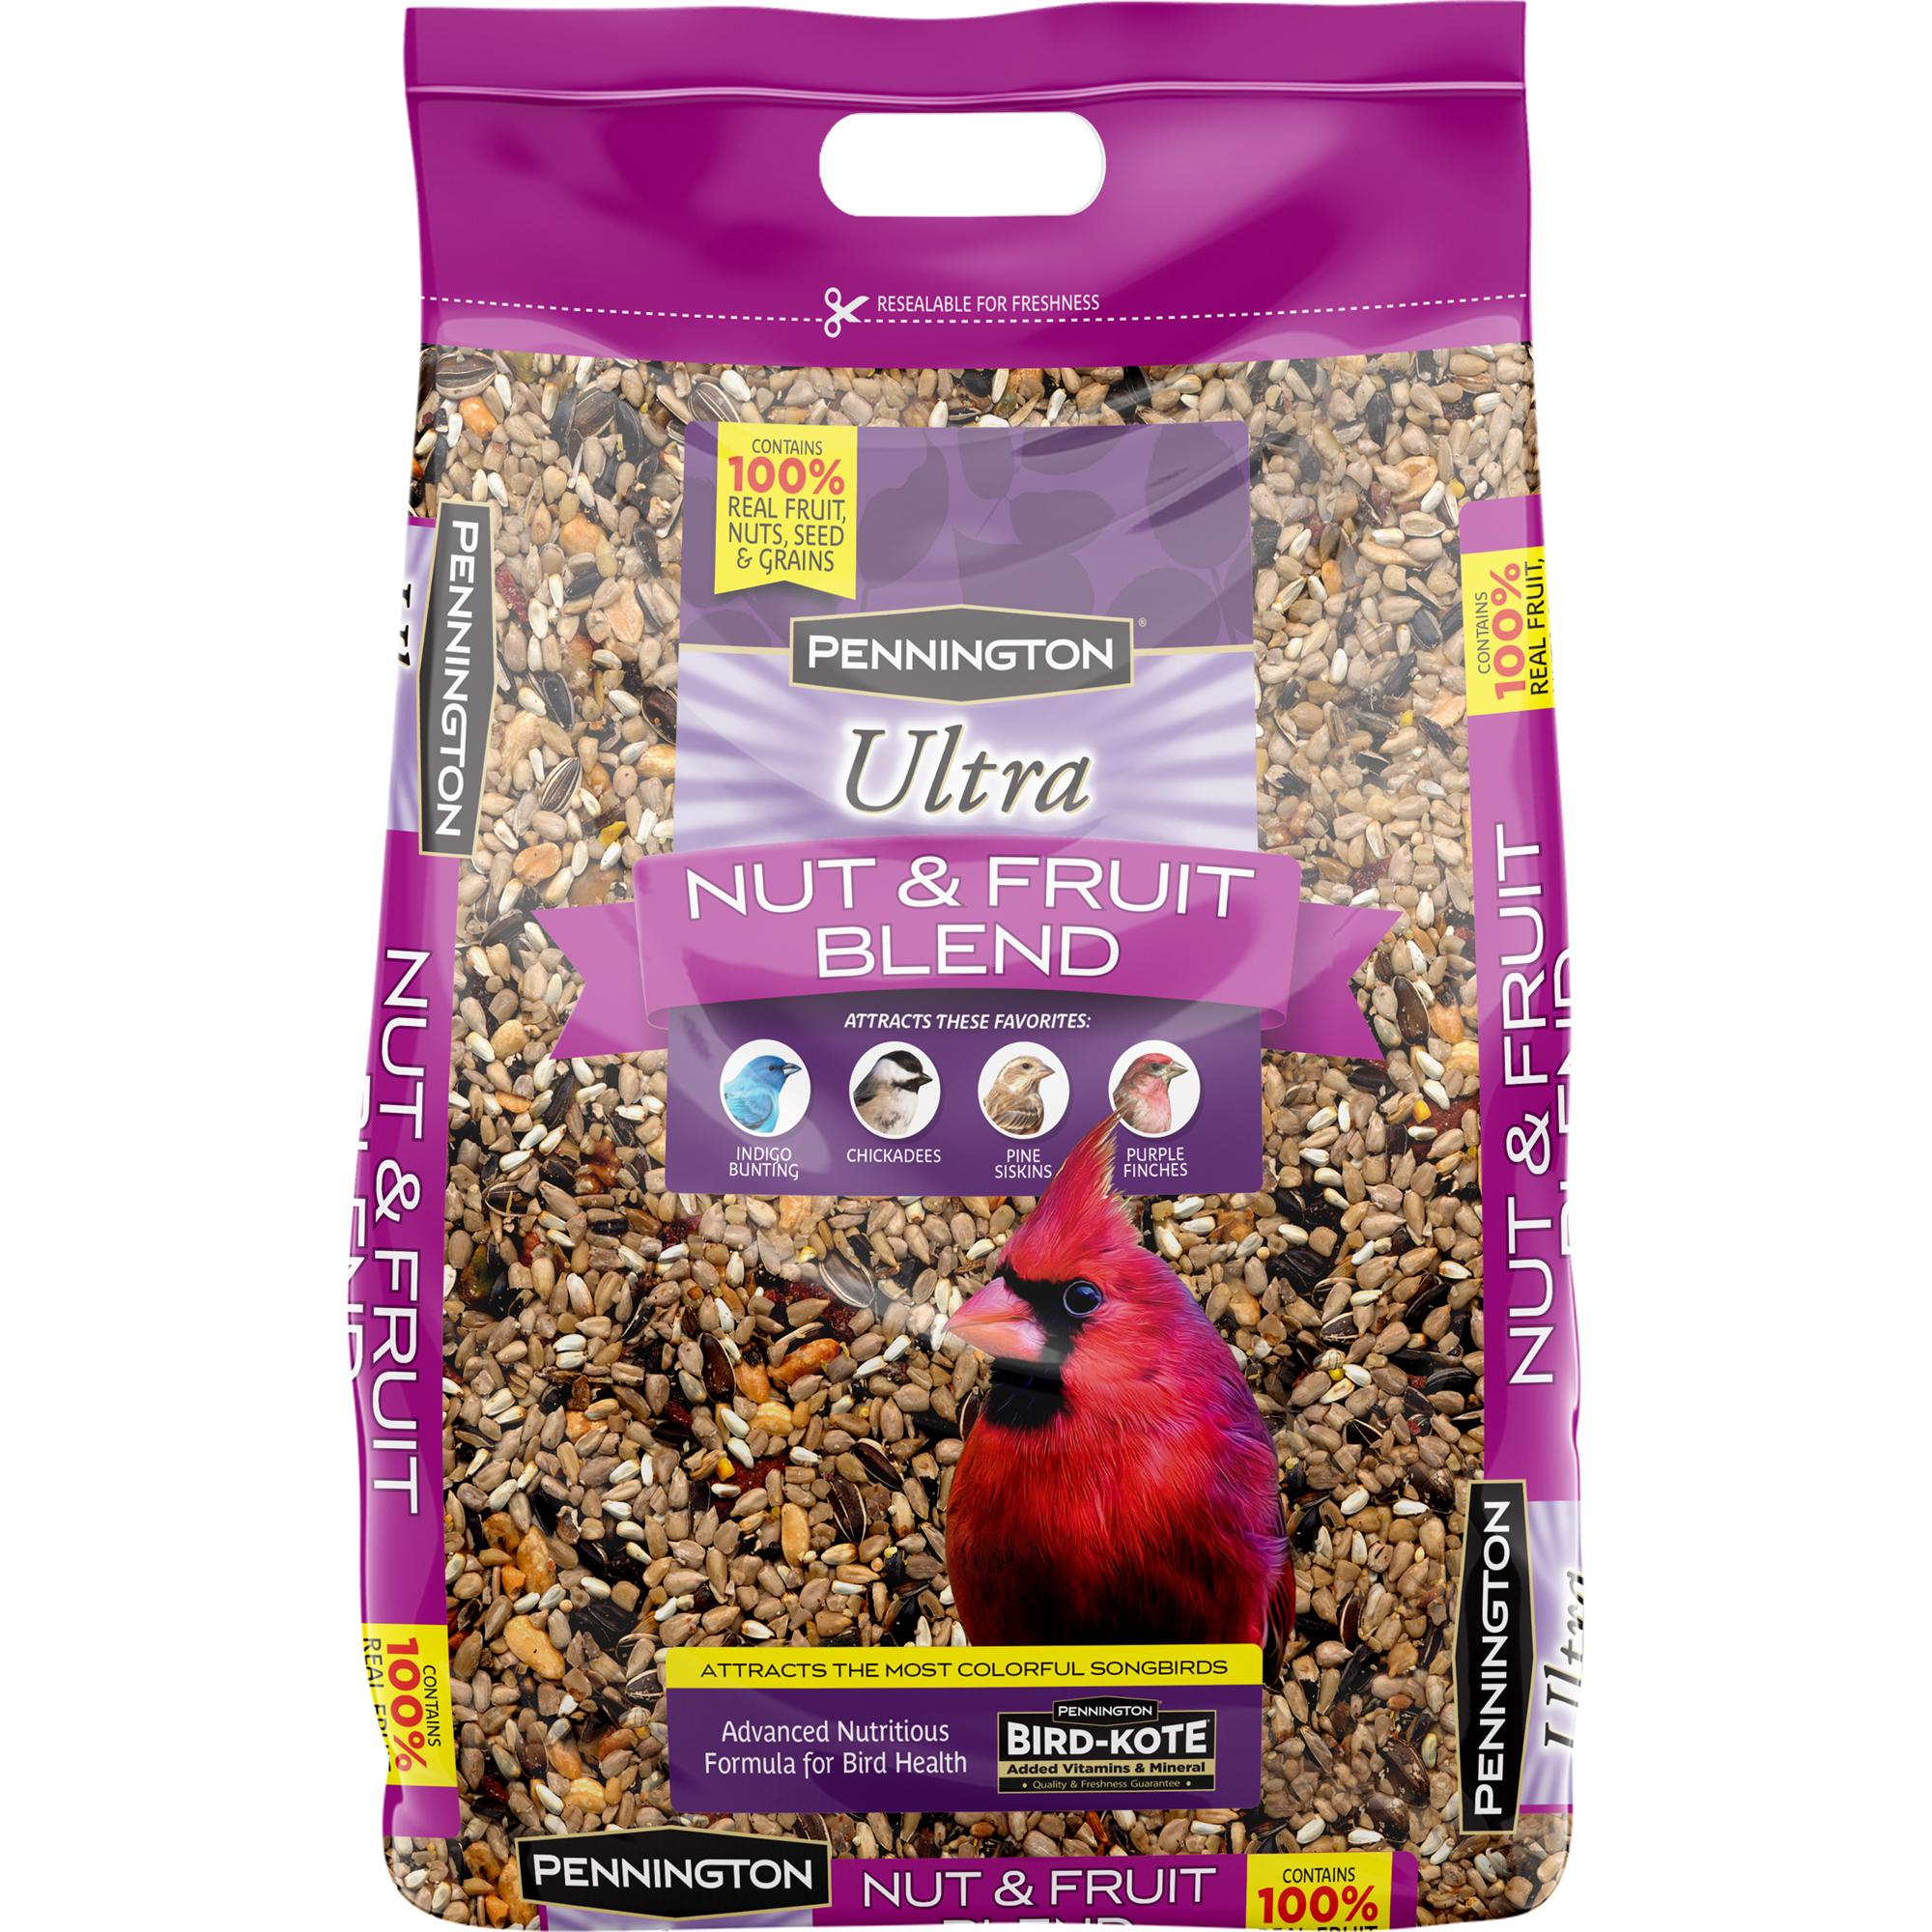 Pennington Ultra Fruit and Nut Blend Wild Bird Seed, 12 lbs